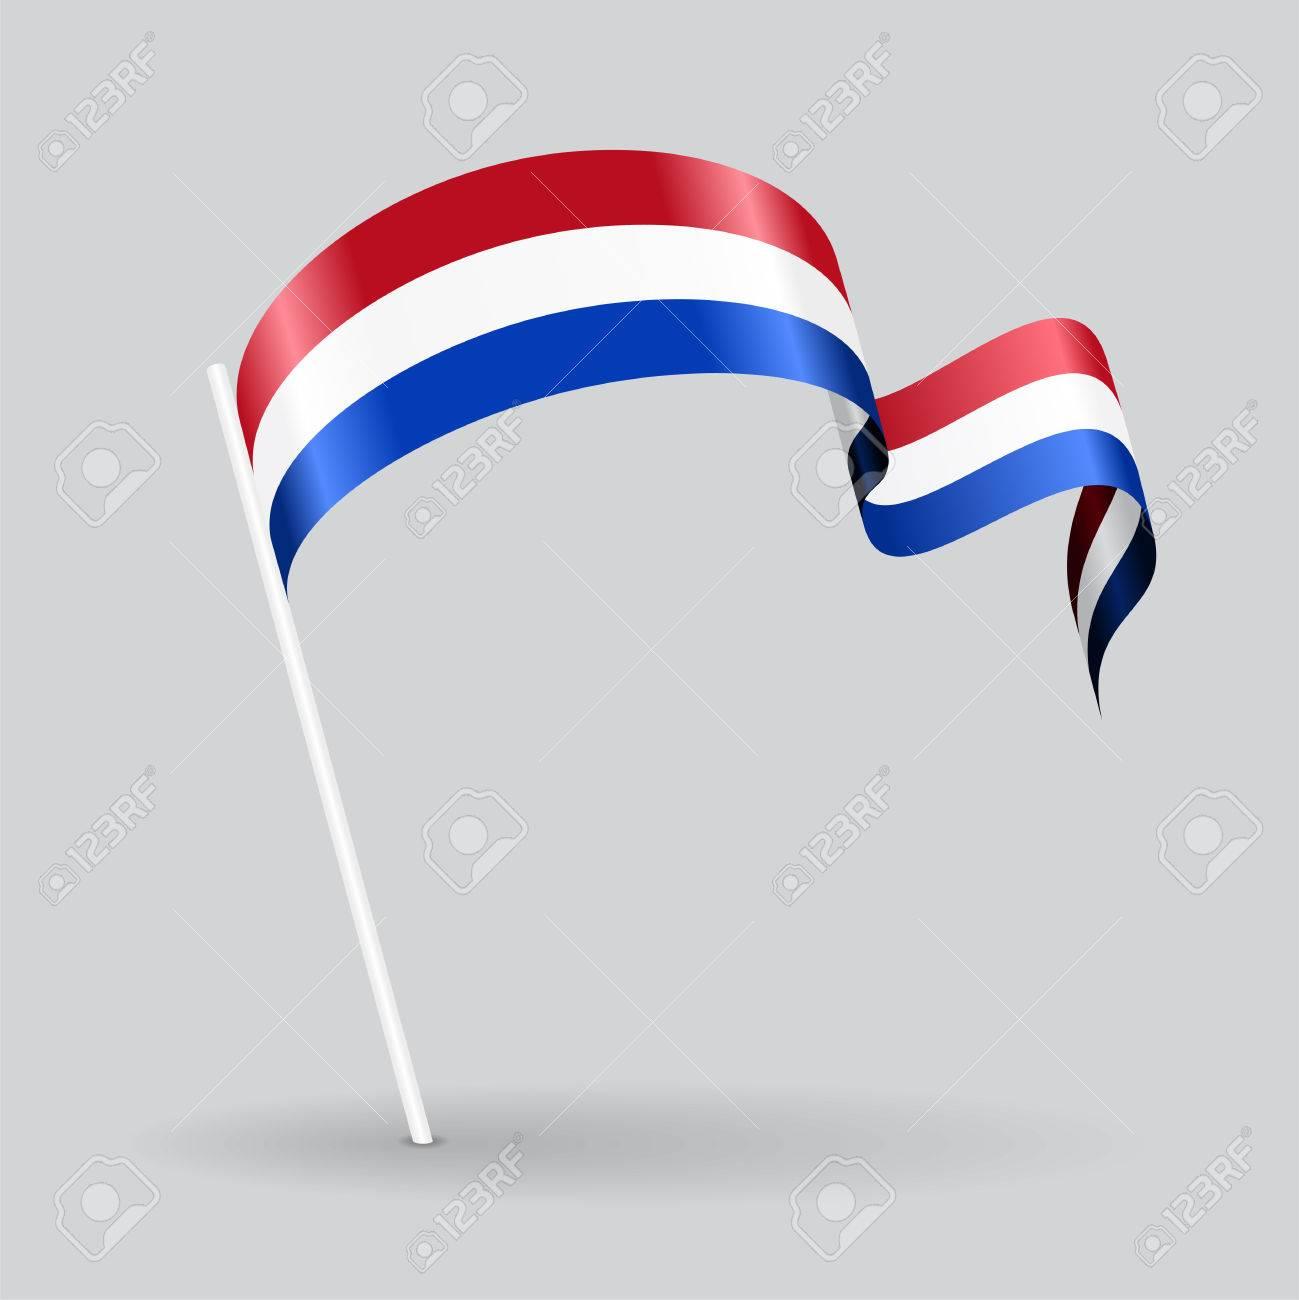 Dutch pin icon wavy flag. Vector illustration. - 60850258